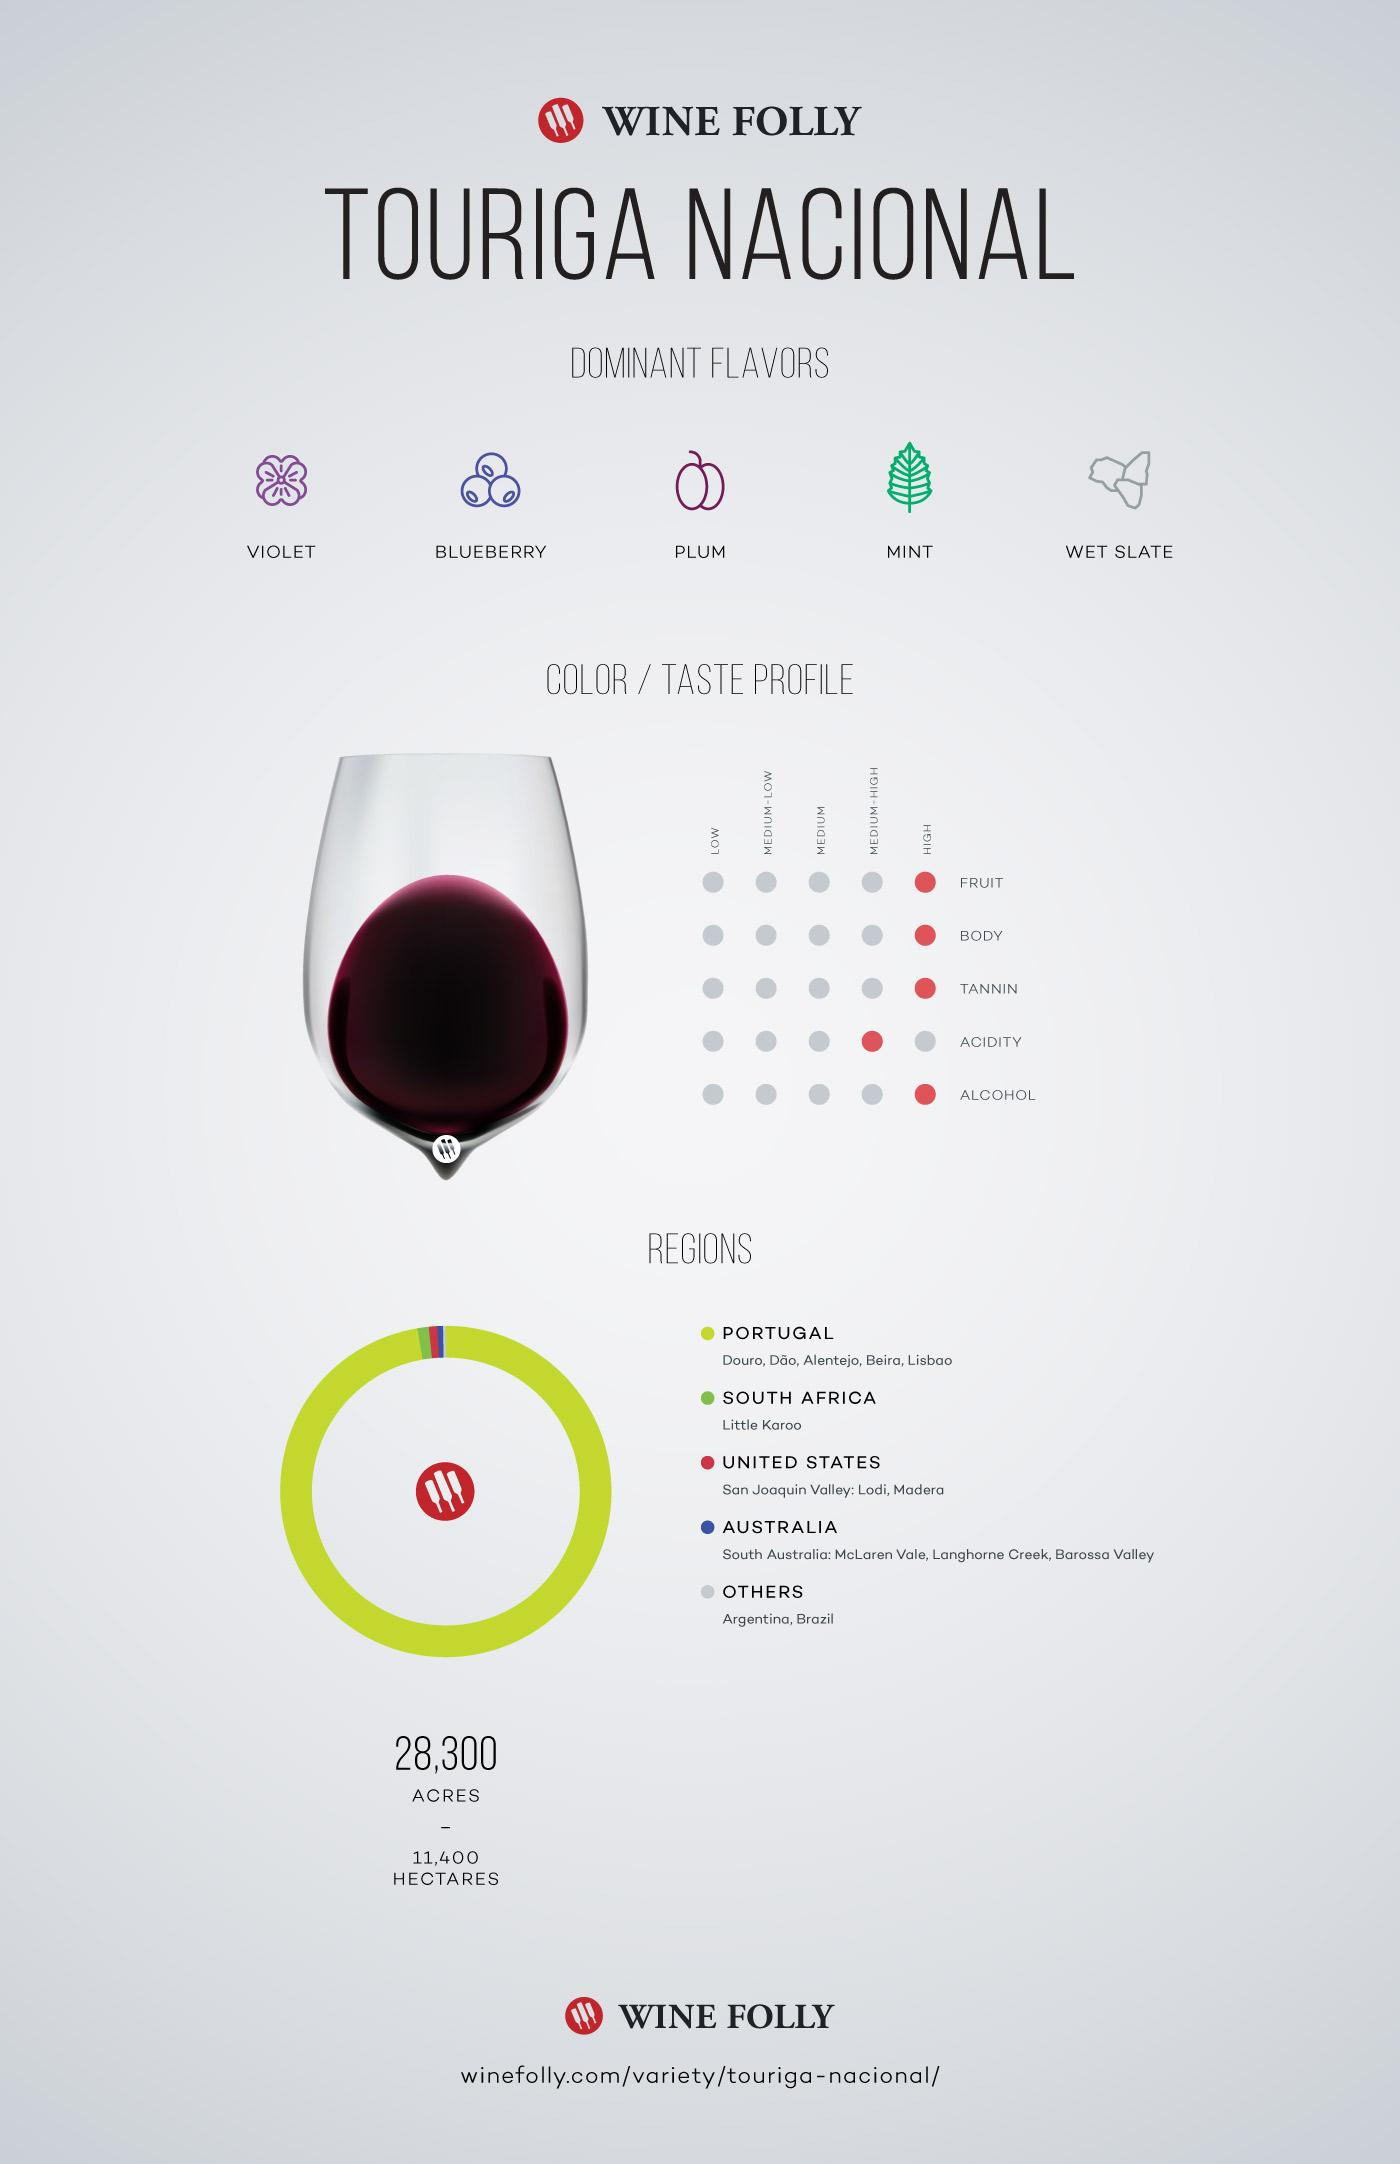 Touriga Nacional Wine Taste Profile by Wine Folly